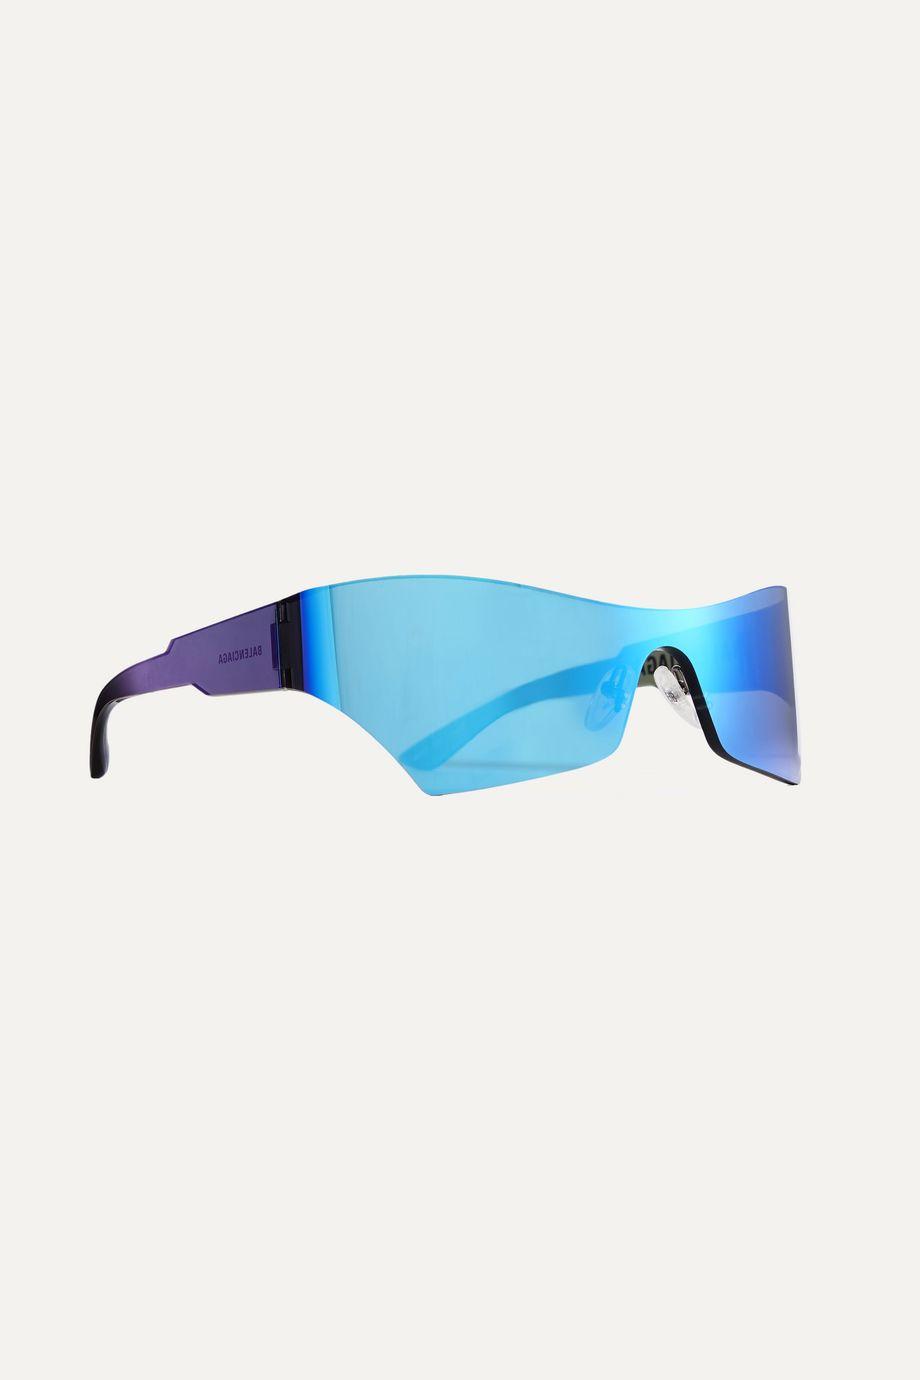 Balenciaga Cat-eye acetate mirrored sunglasses